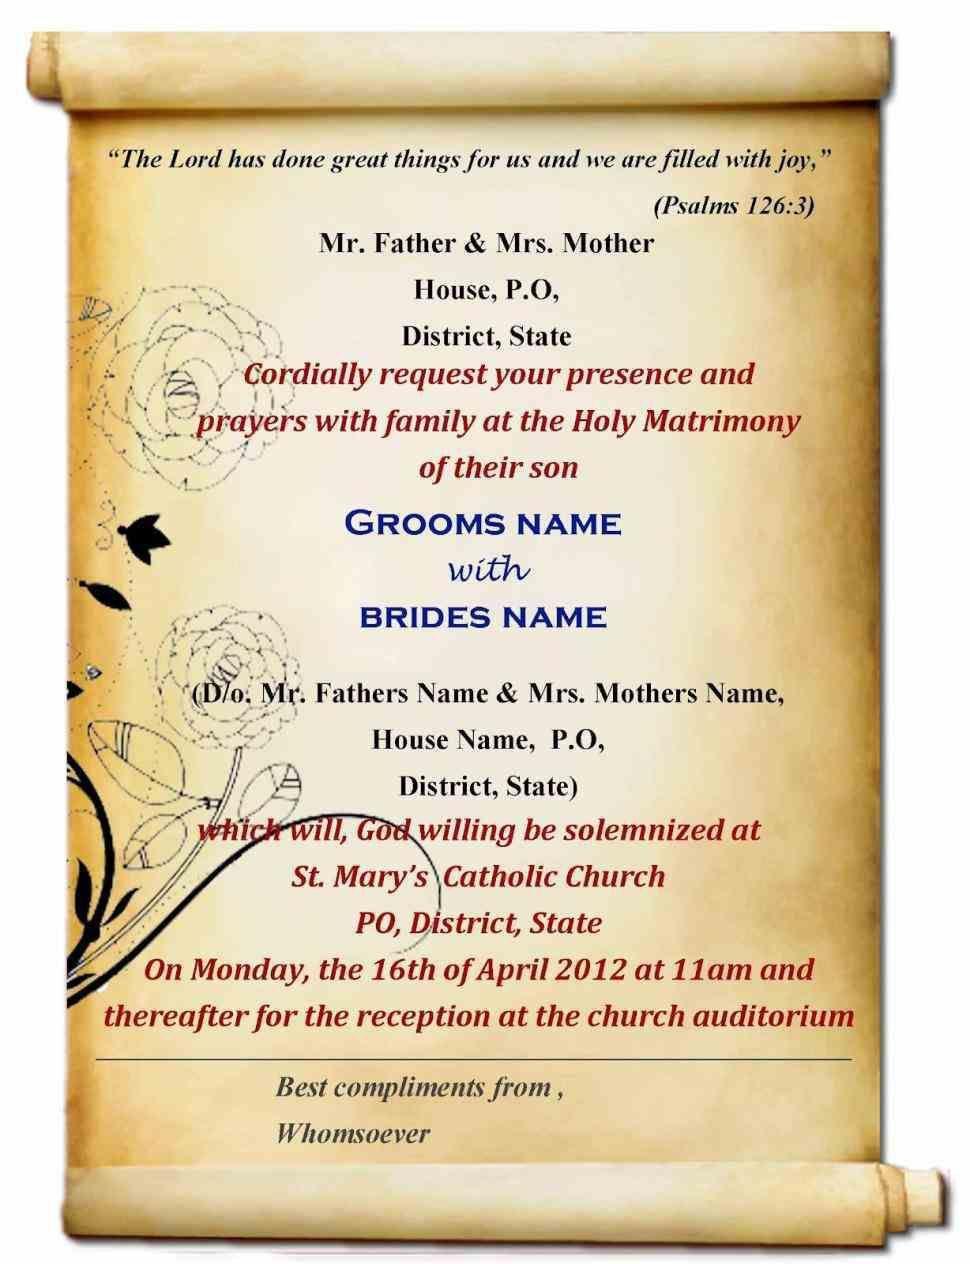 birthday invitation : online birthday invitations - Free Invitation ...